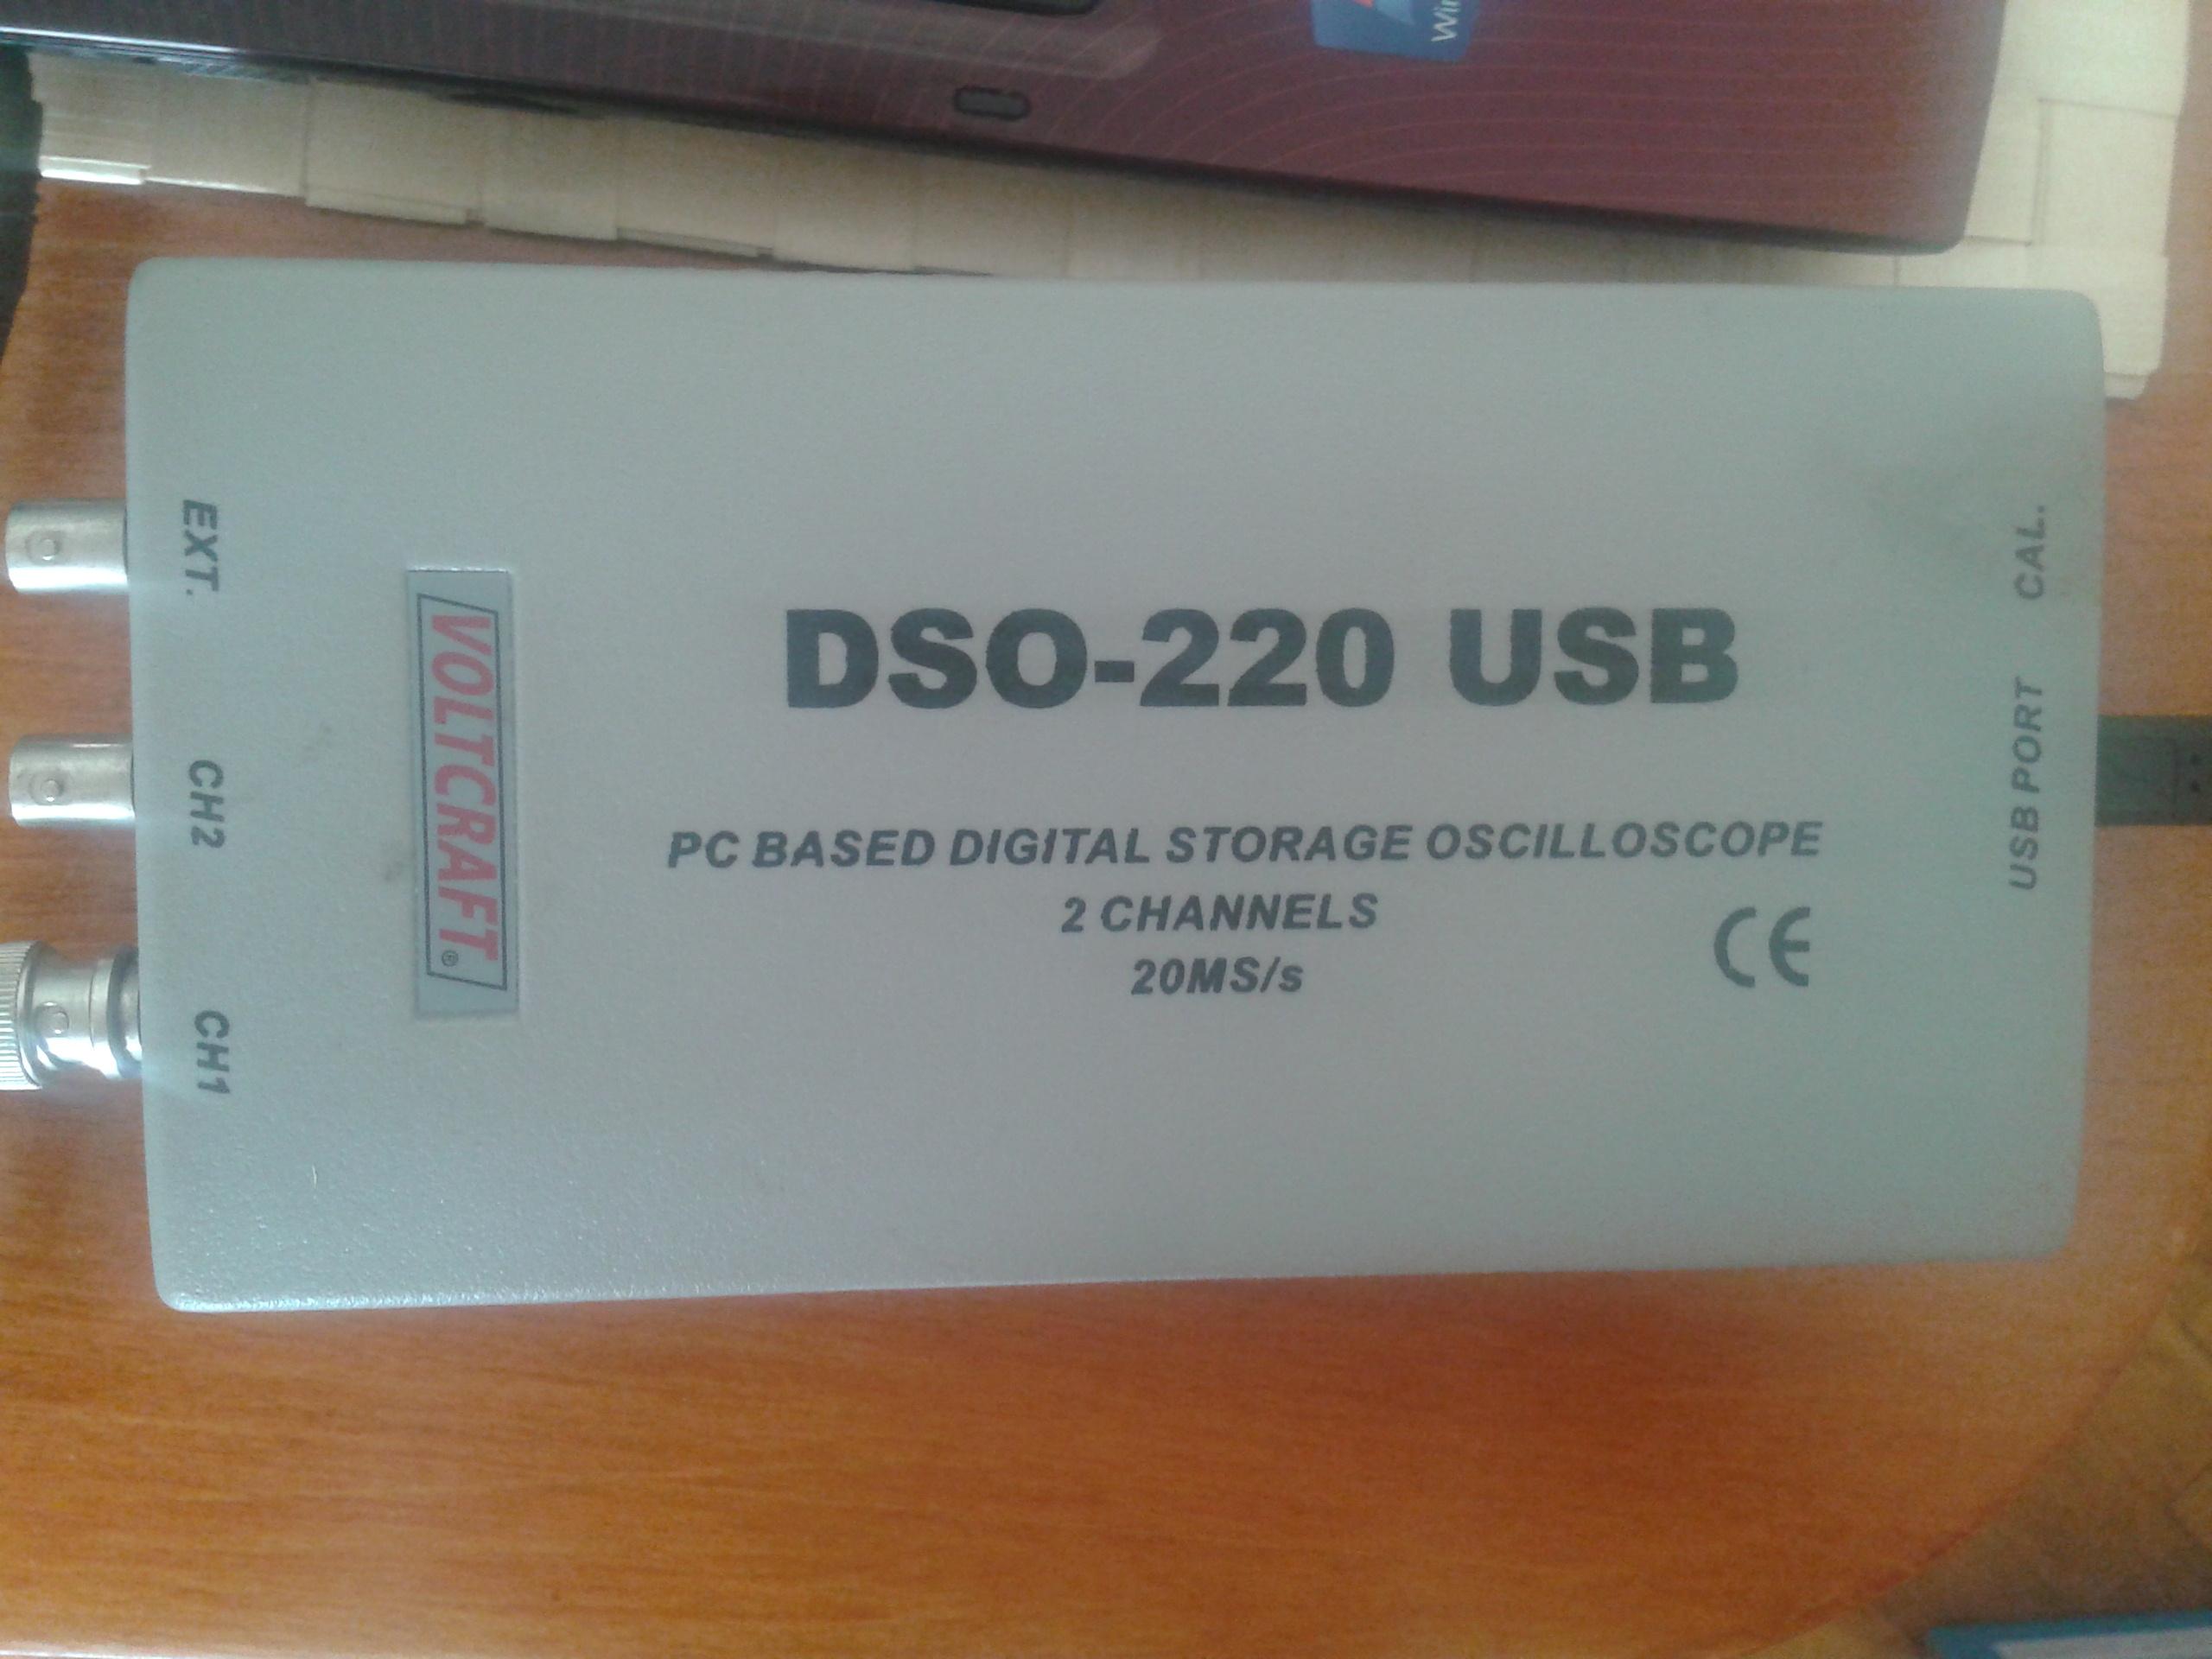 Oscyloskop Voltcraft DSO-220  - Potrzebne sterowniki do Windows 7.